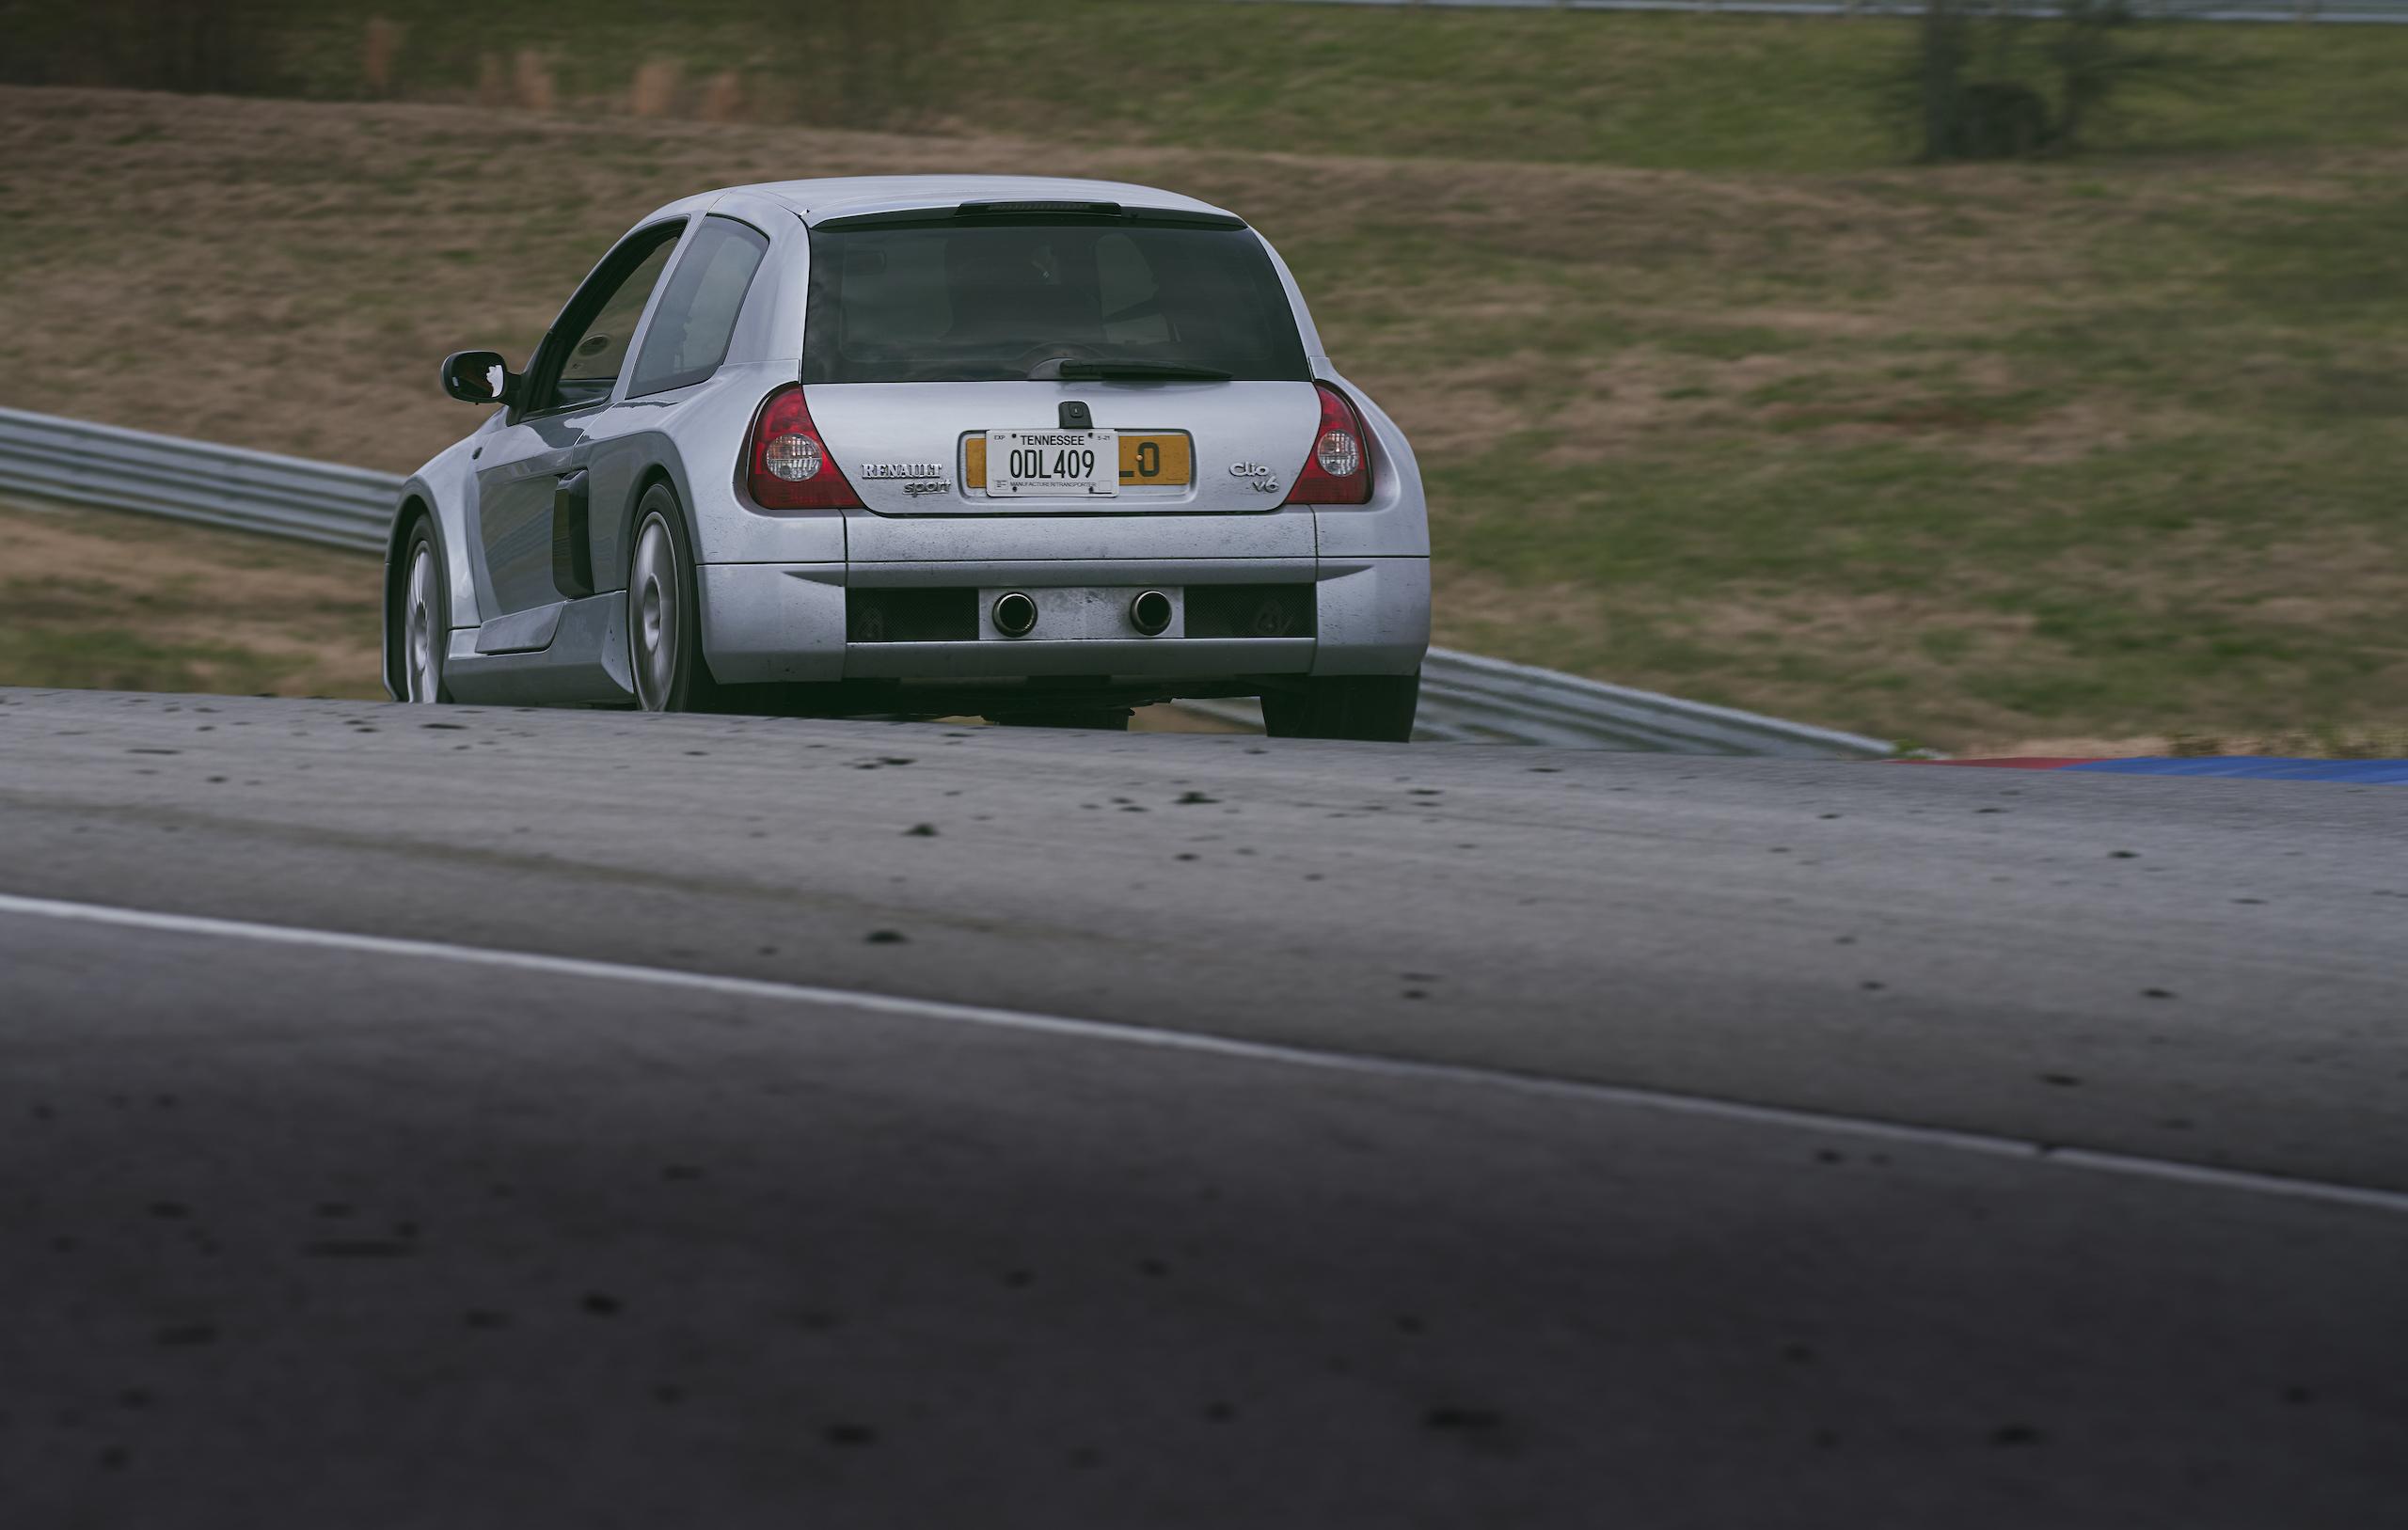 2002 Renault Clio V6 rear three-quarter track action